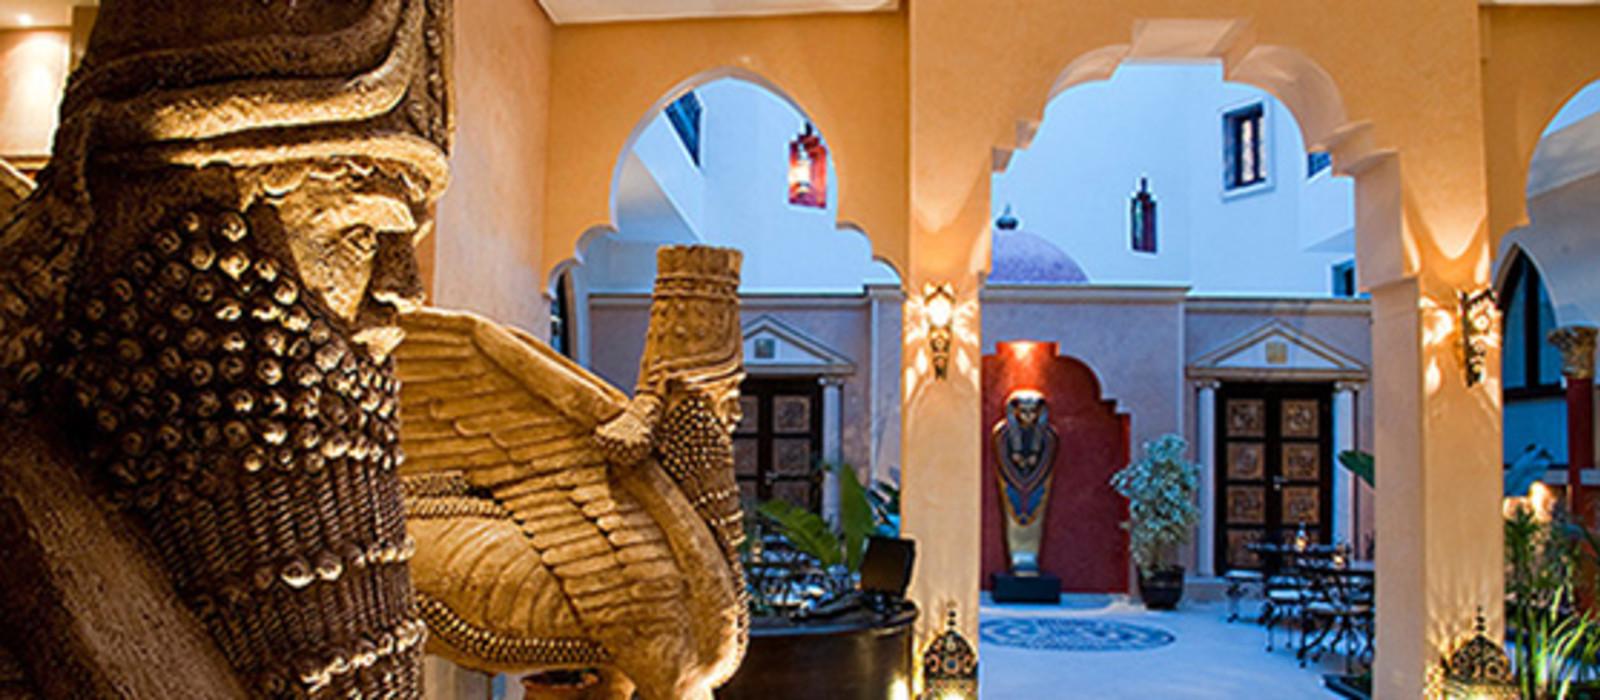 Hotel Temple des Arts Morocco